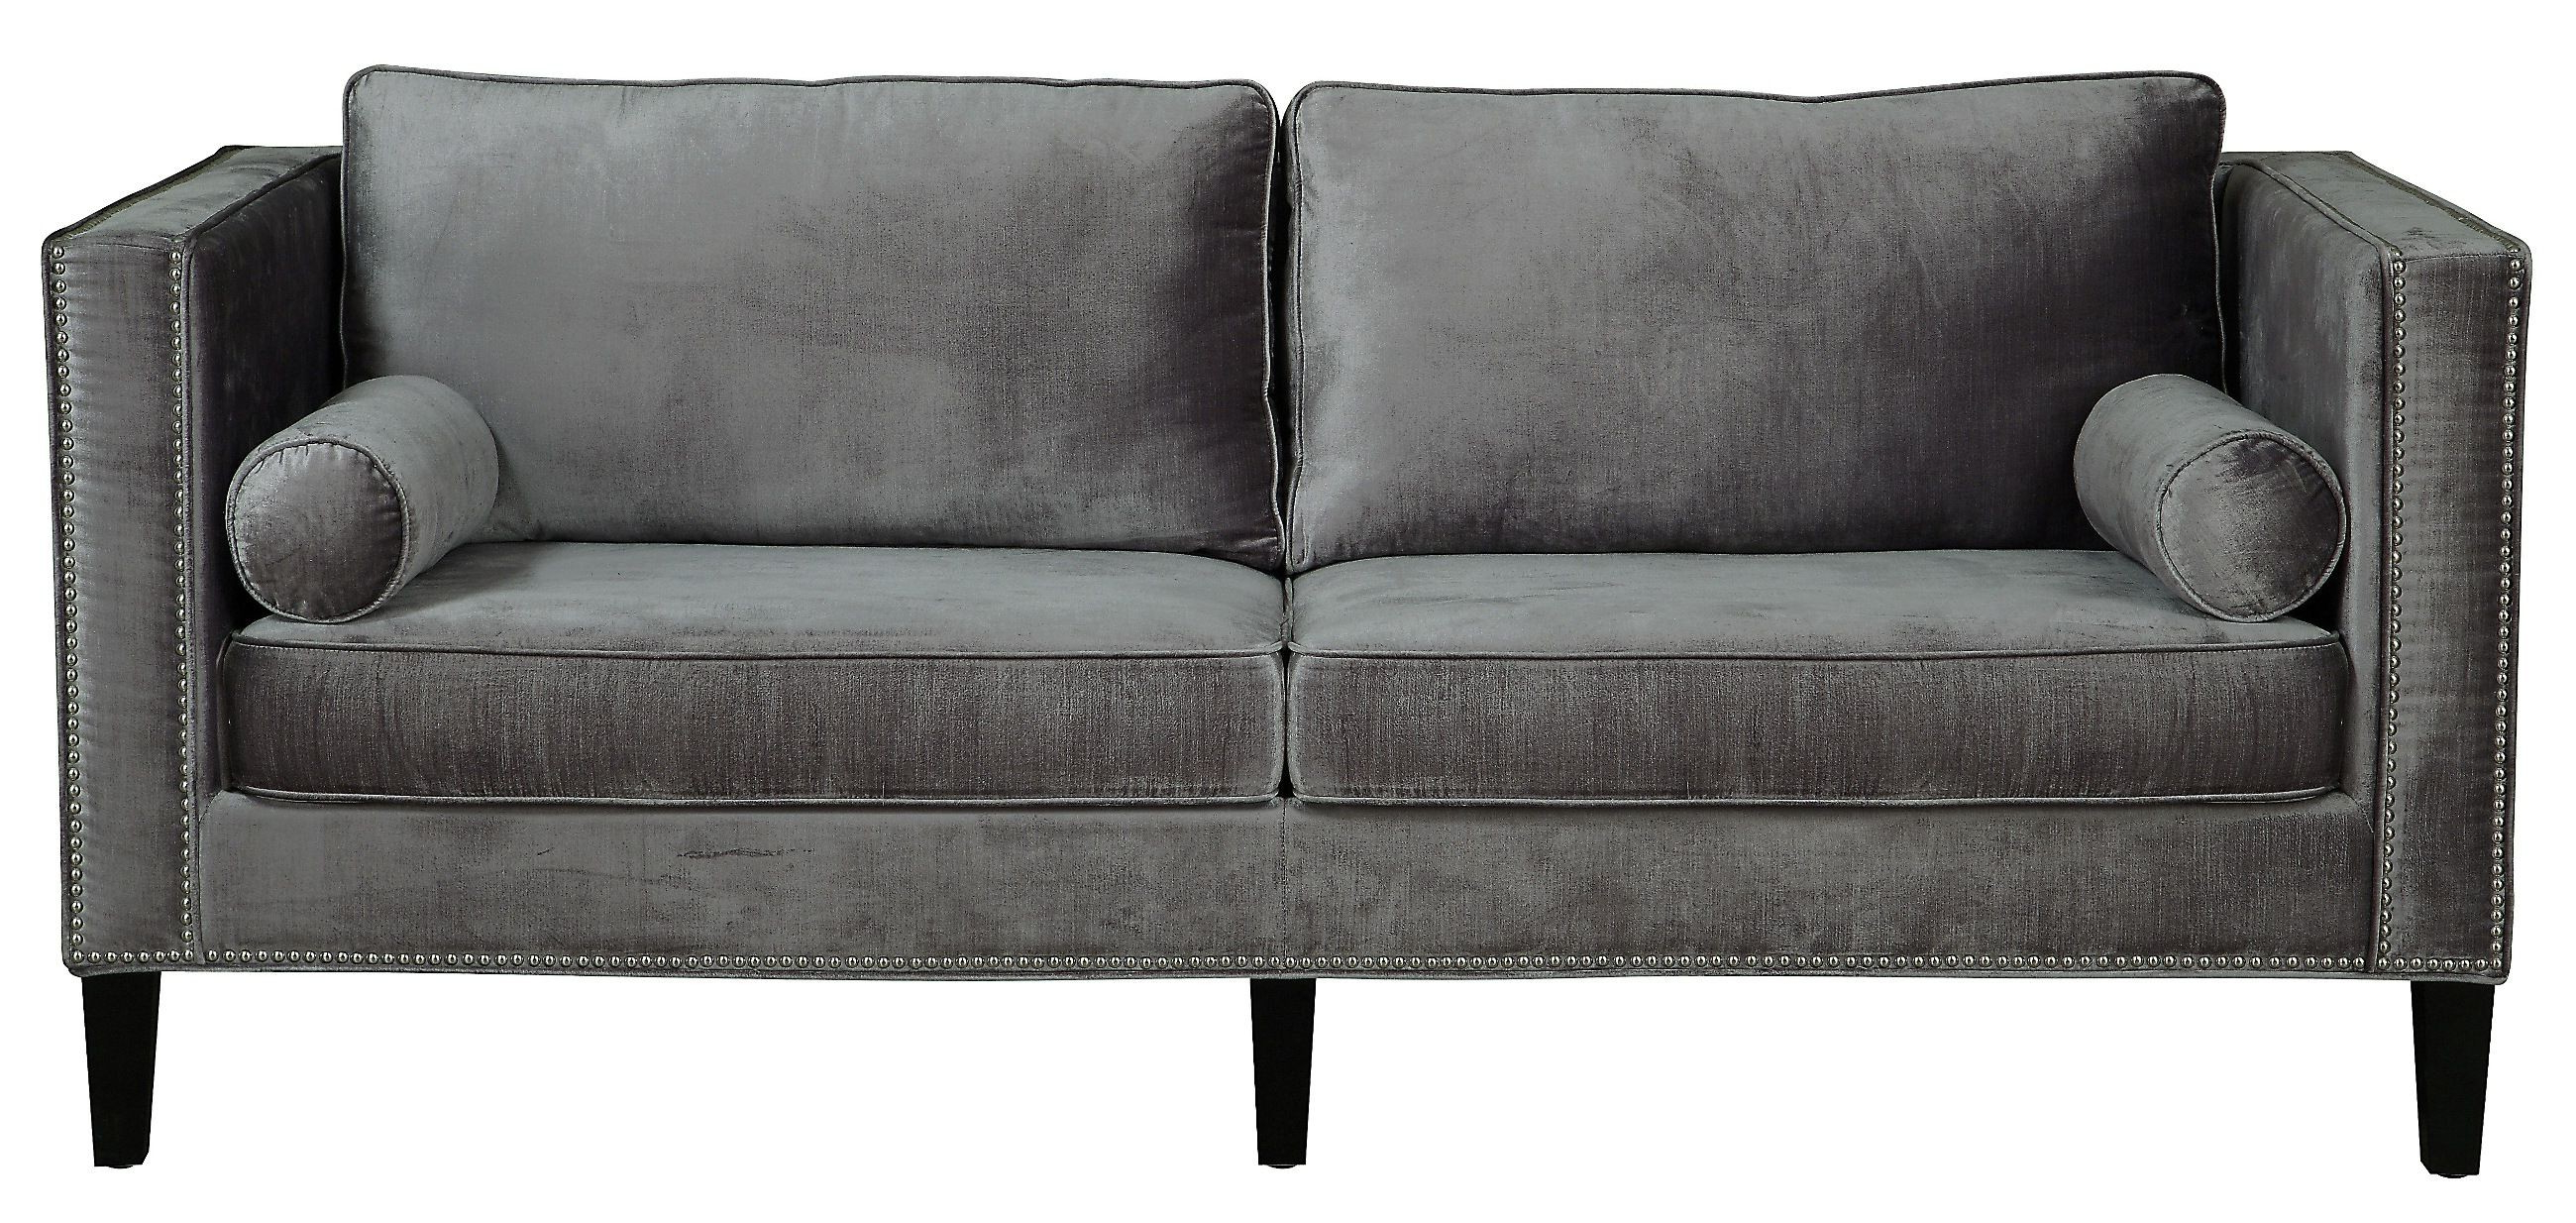 London Dark Grey Sofa Chairs Regarding Trendy Grey Velvet Sofa Sets Farmhousegray With Nailhead Trimgrey Farmhouse (View 13 of 20)